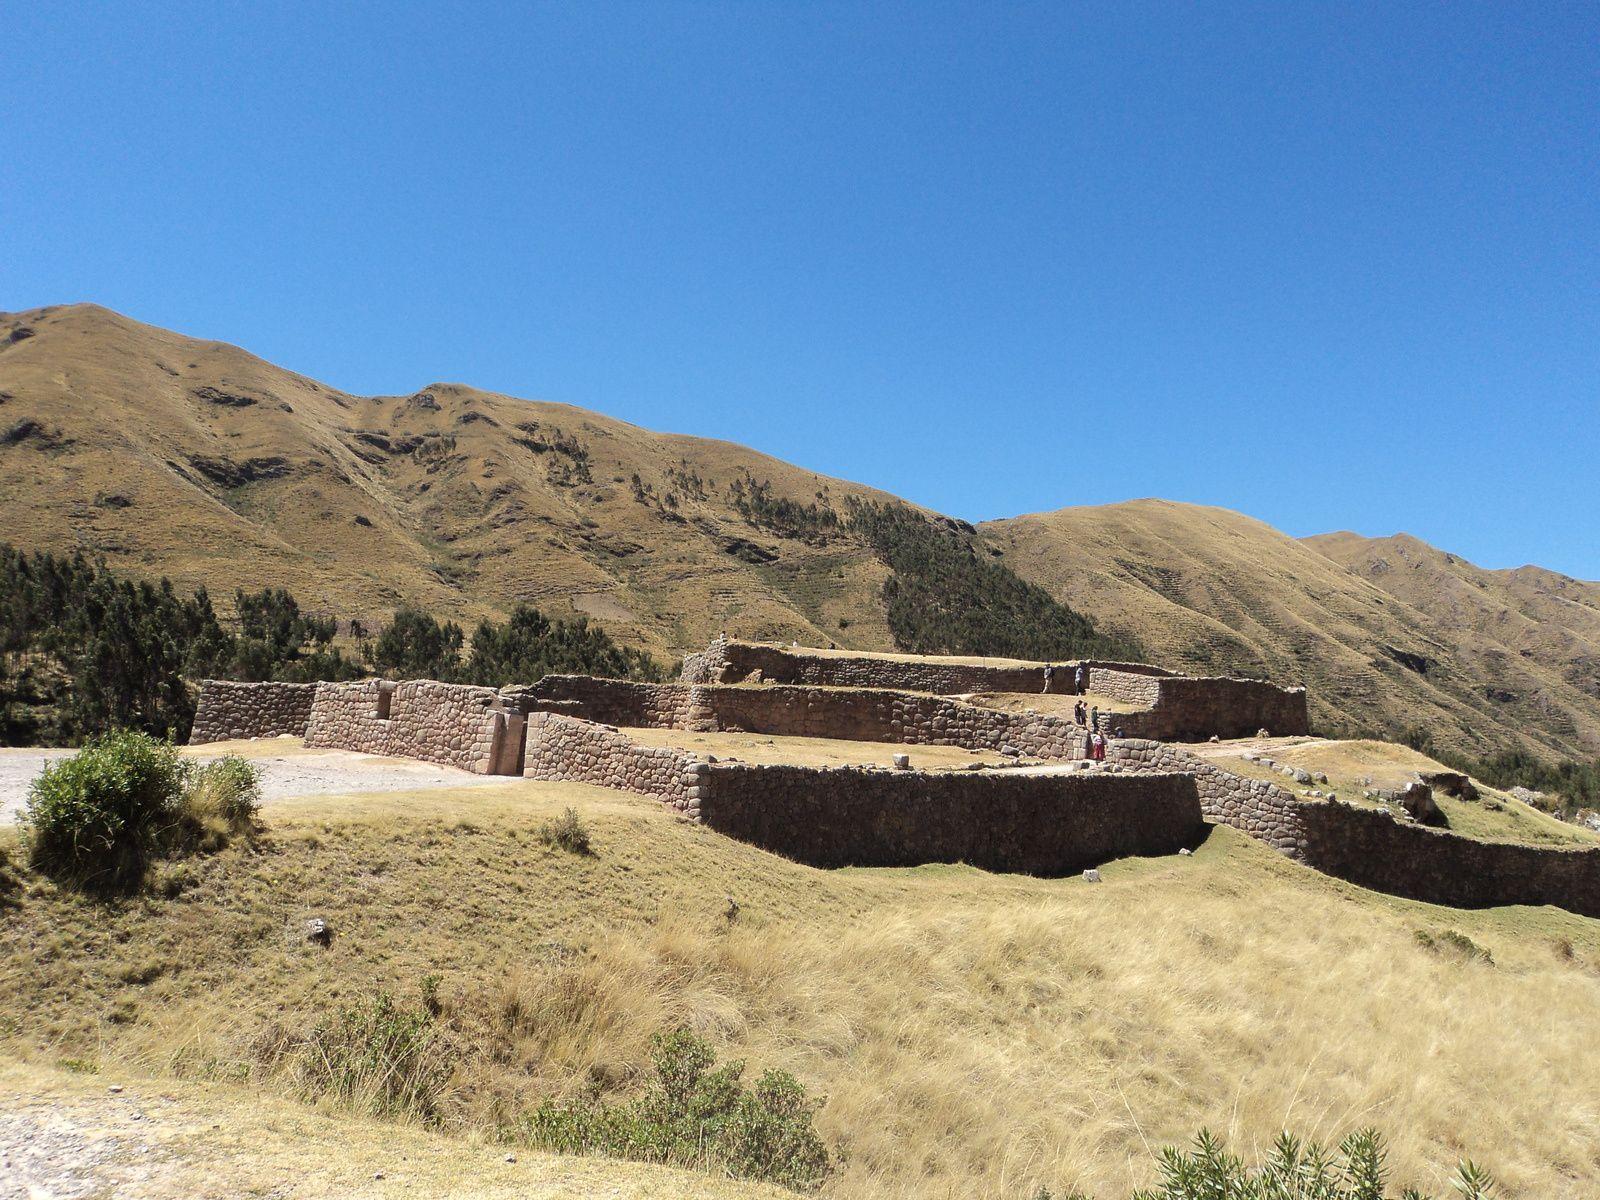 29 août - 1er septembre 2015: De Cusco à Machu Picchu... à Québec (Partie III)